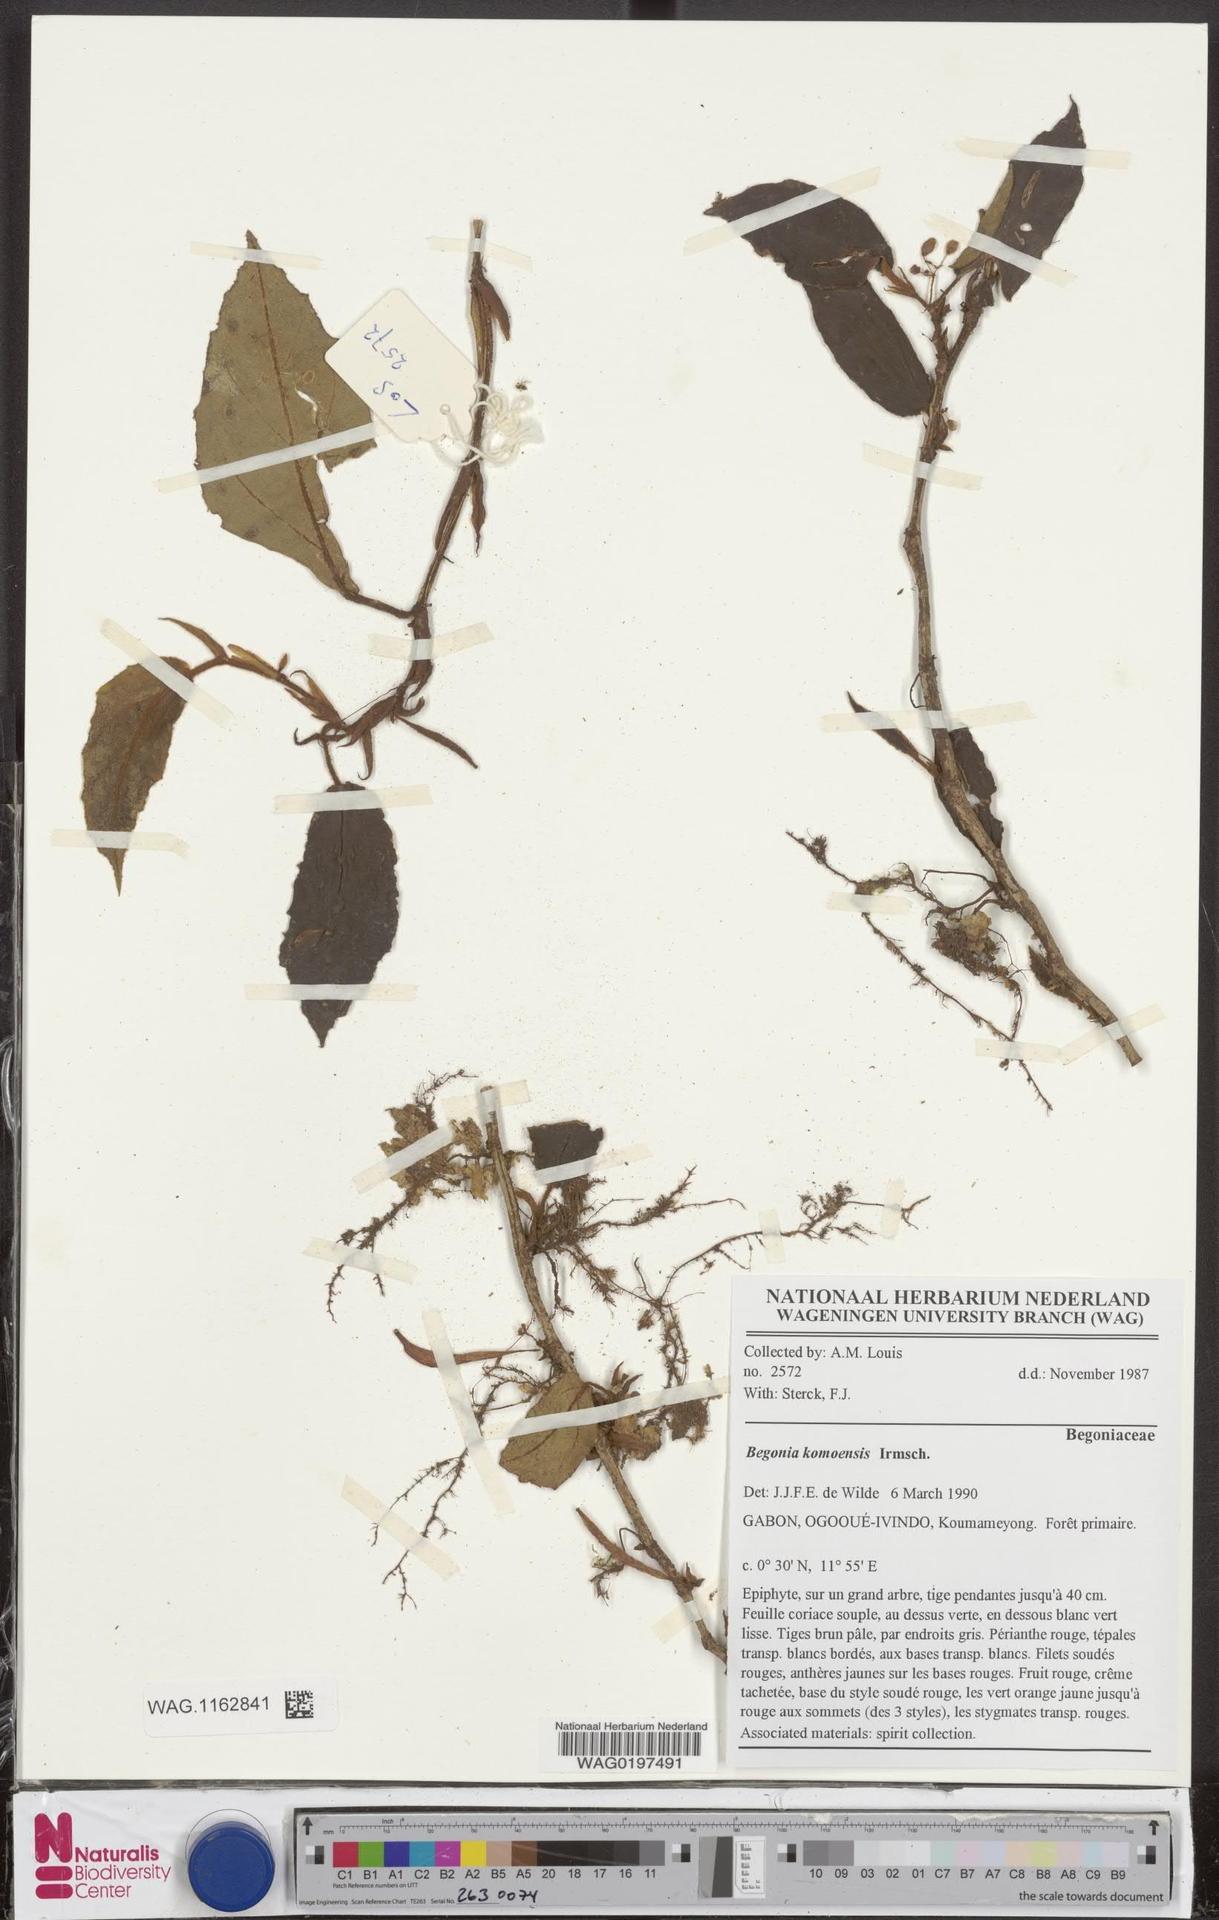 WAG.1162841 | Begonia komoensis Irmsch.